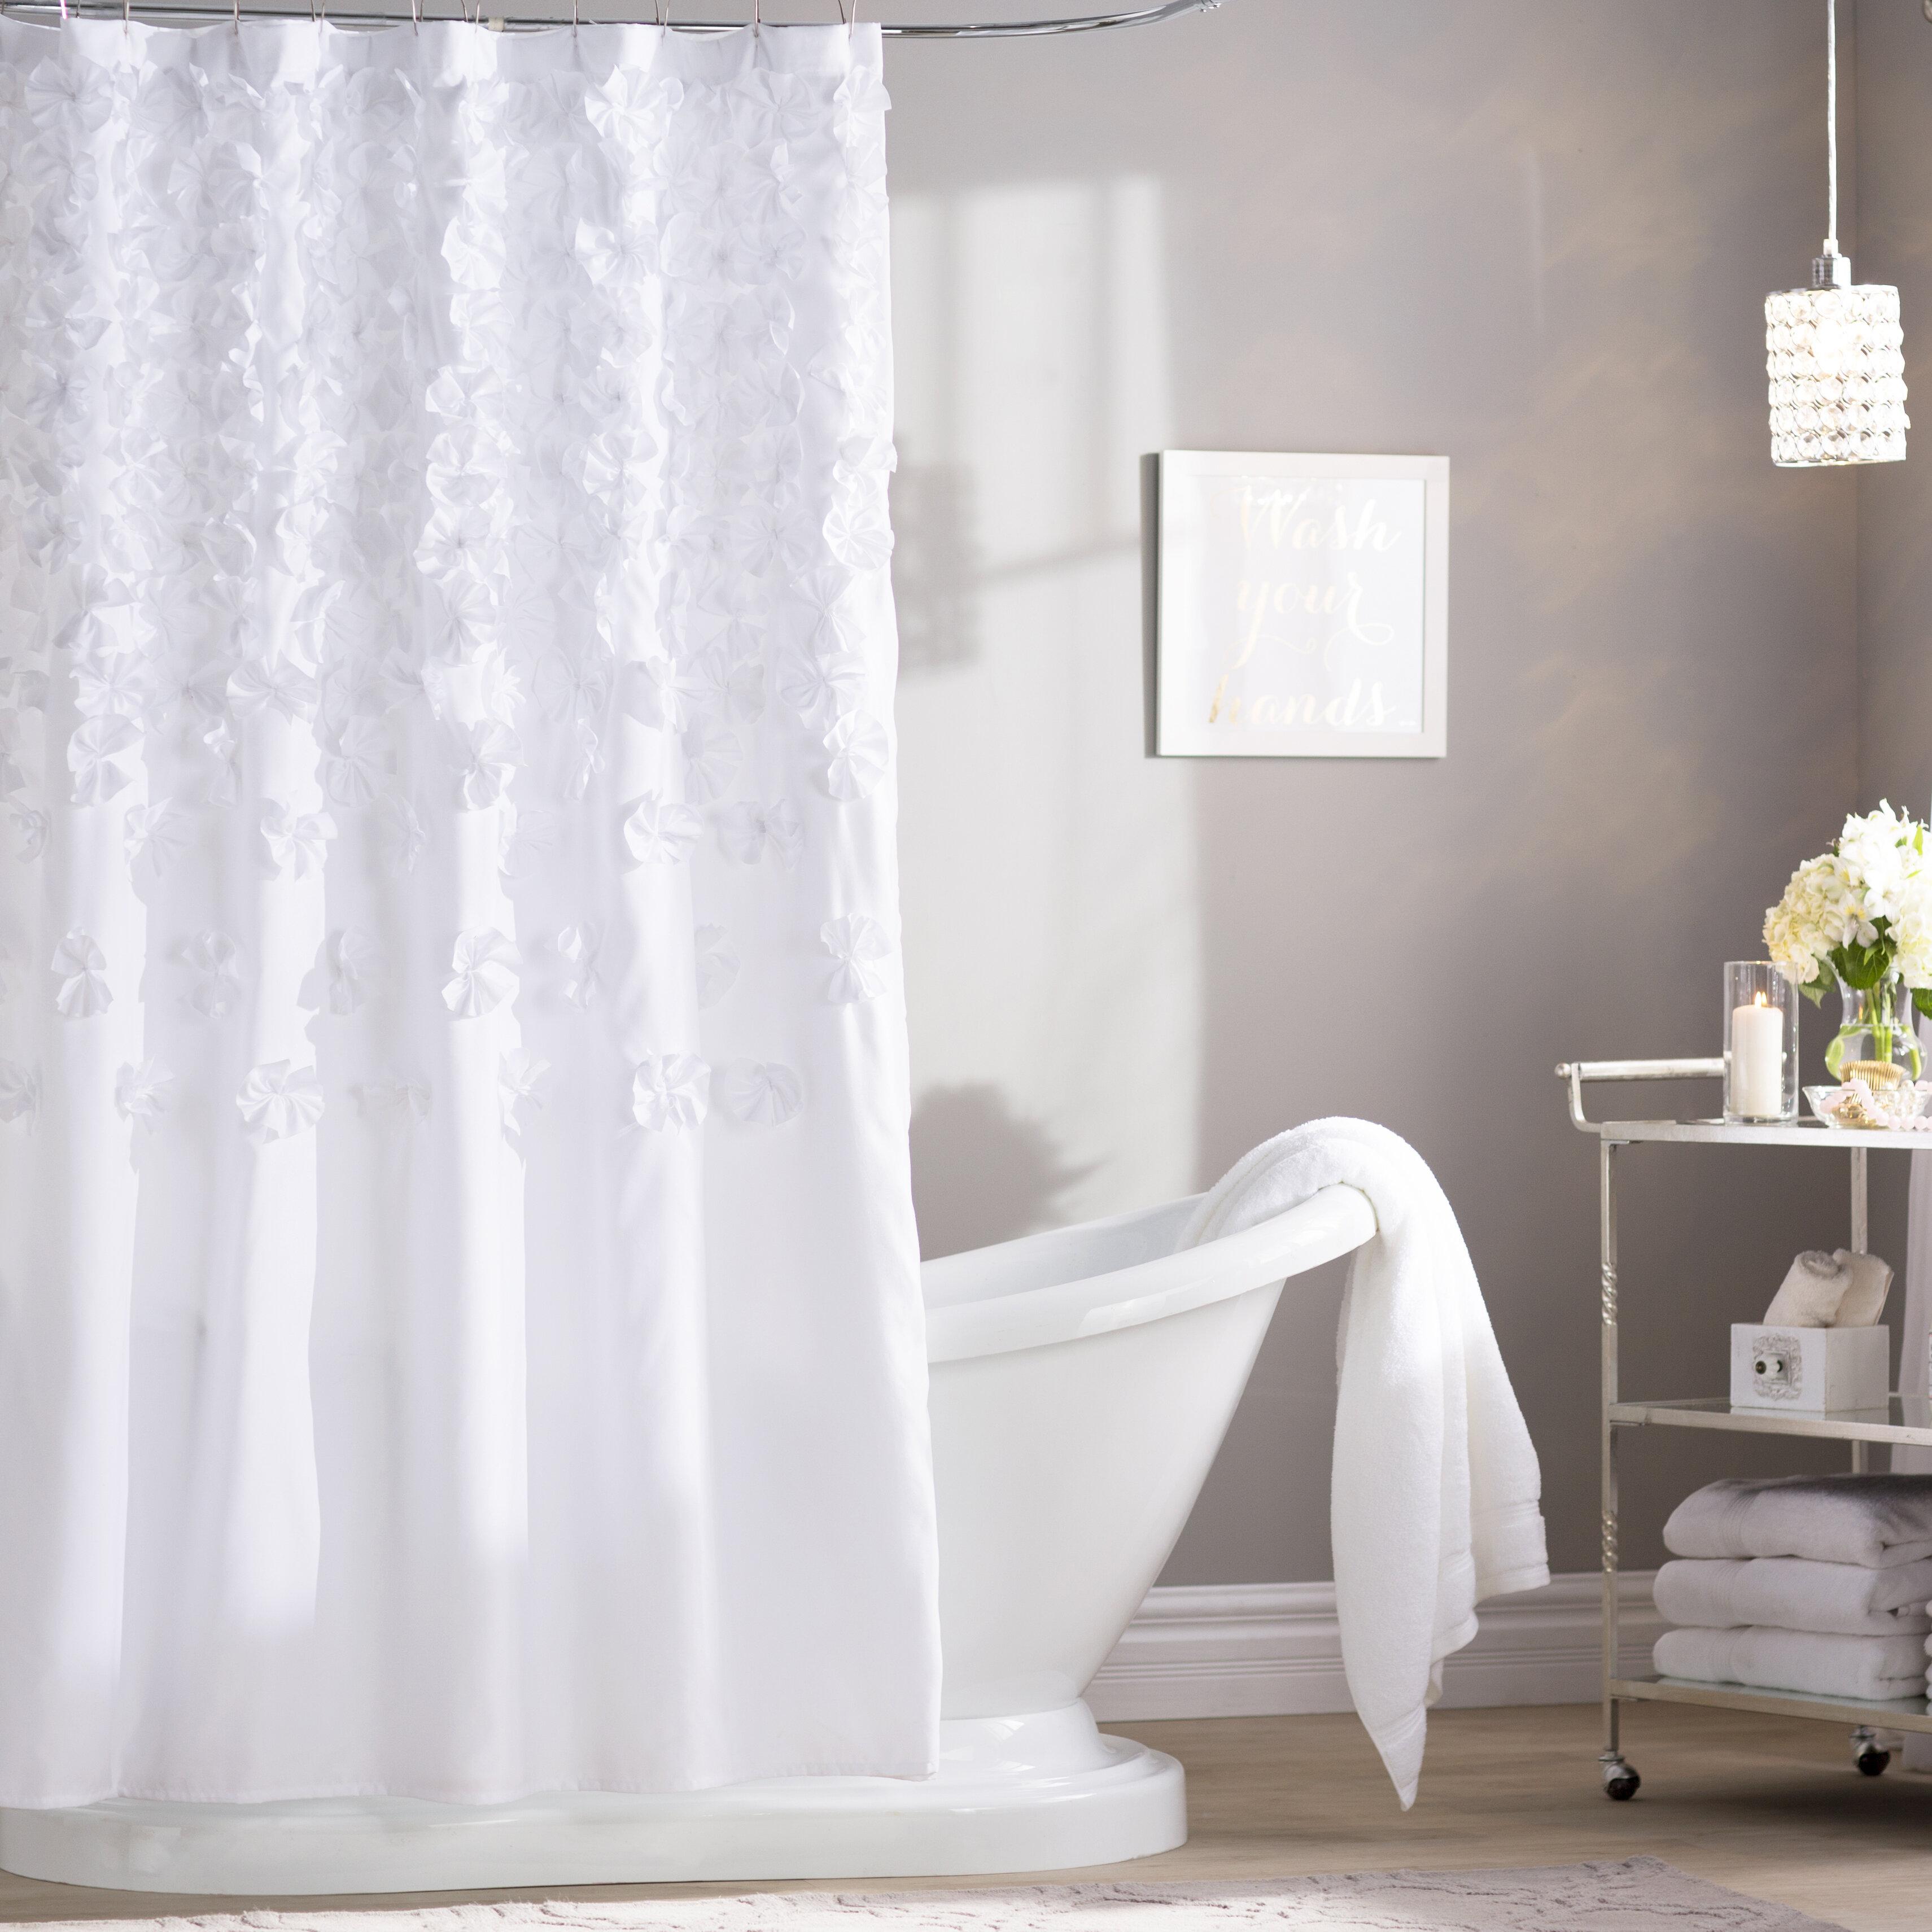 of elegant curtains curtain perth john bathroom com inspirations furniture shower robshaw dkbzaweb